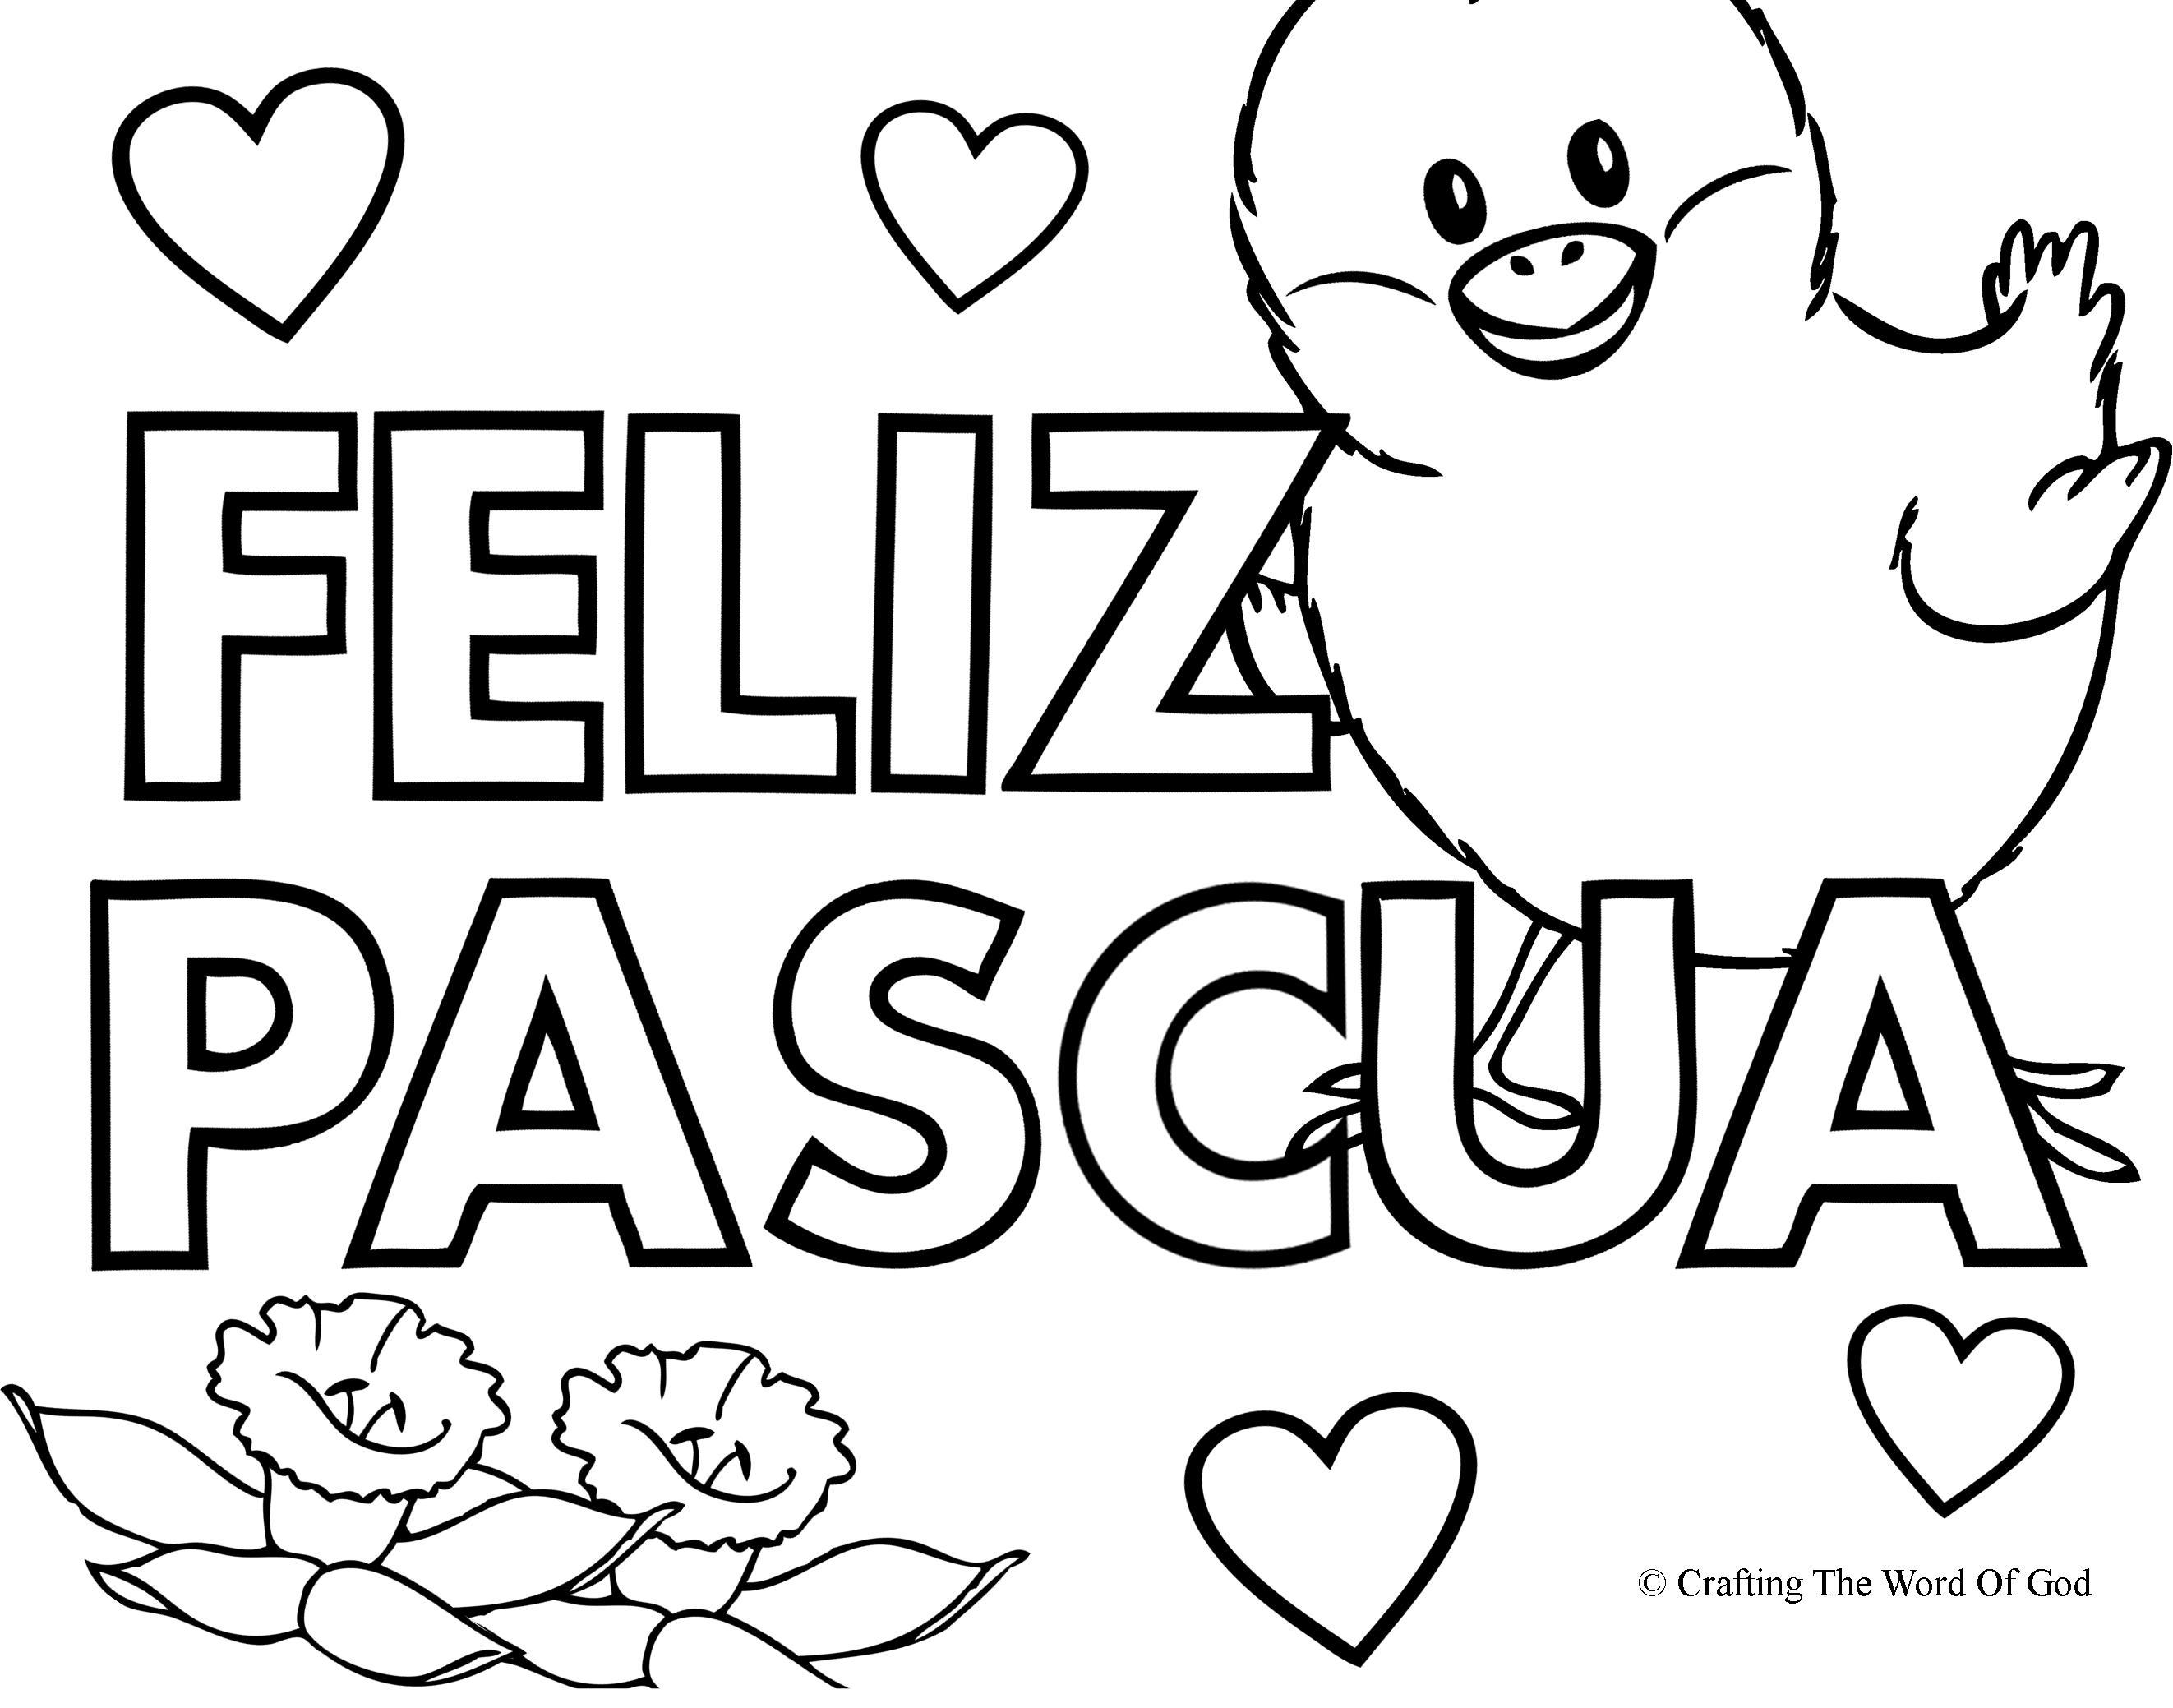 feliz pascua coloring pages | feliz pascua « Manualidades Biblicas